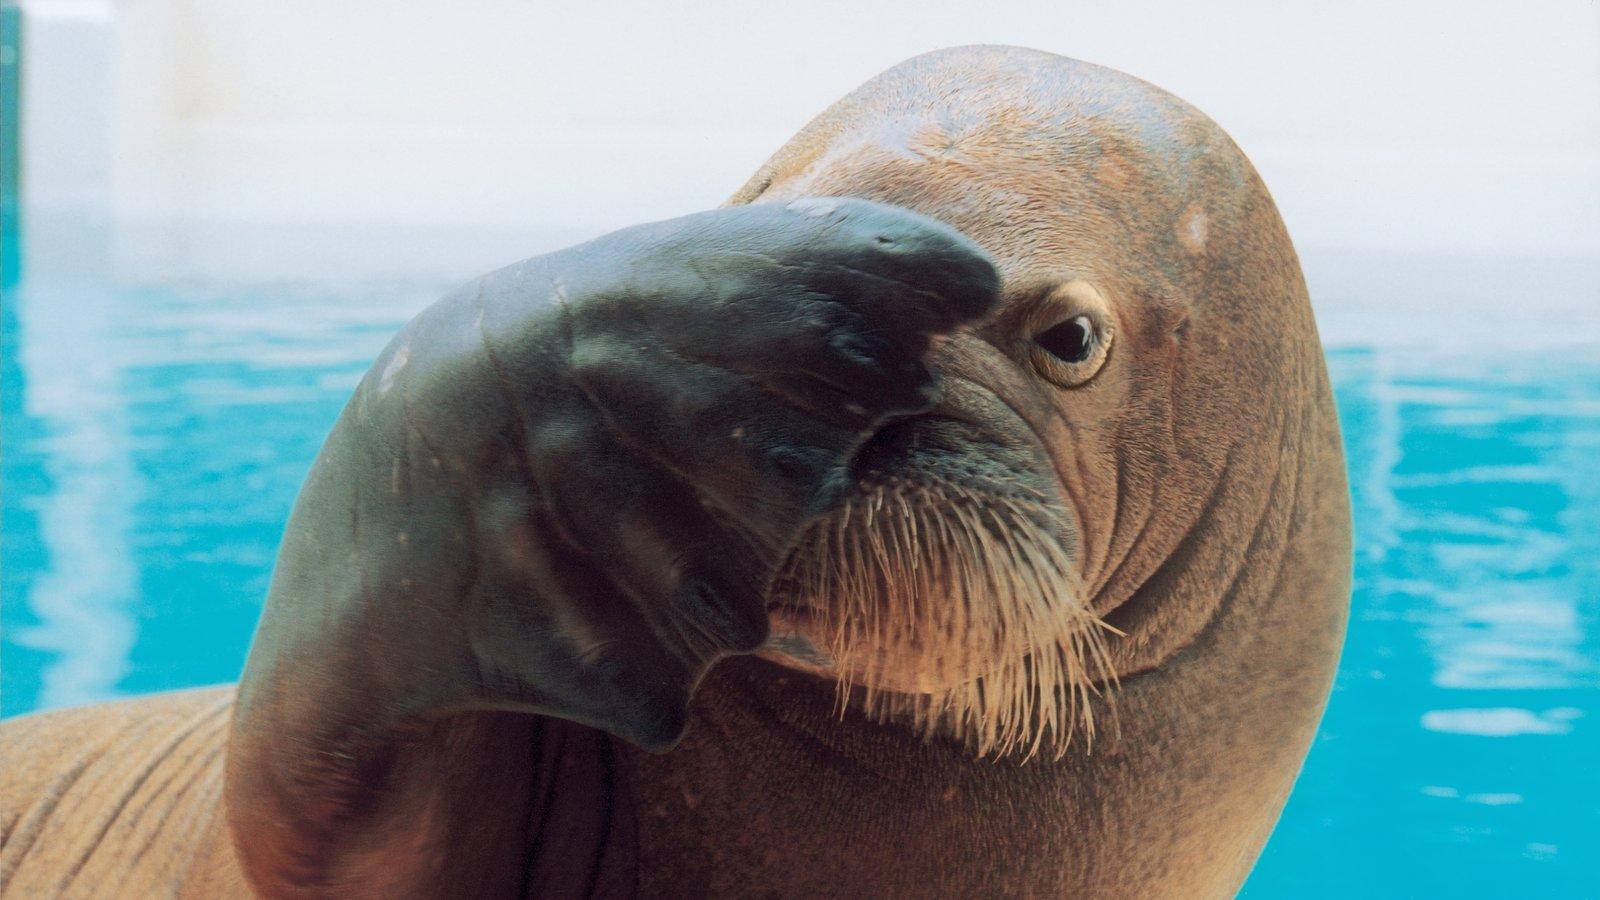 Marineland caracterizando vida marinha, animais de zoológico e passeios